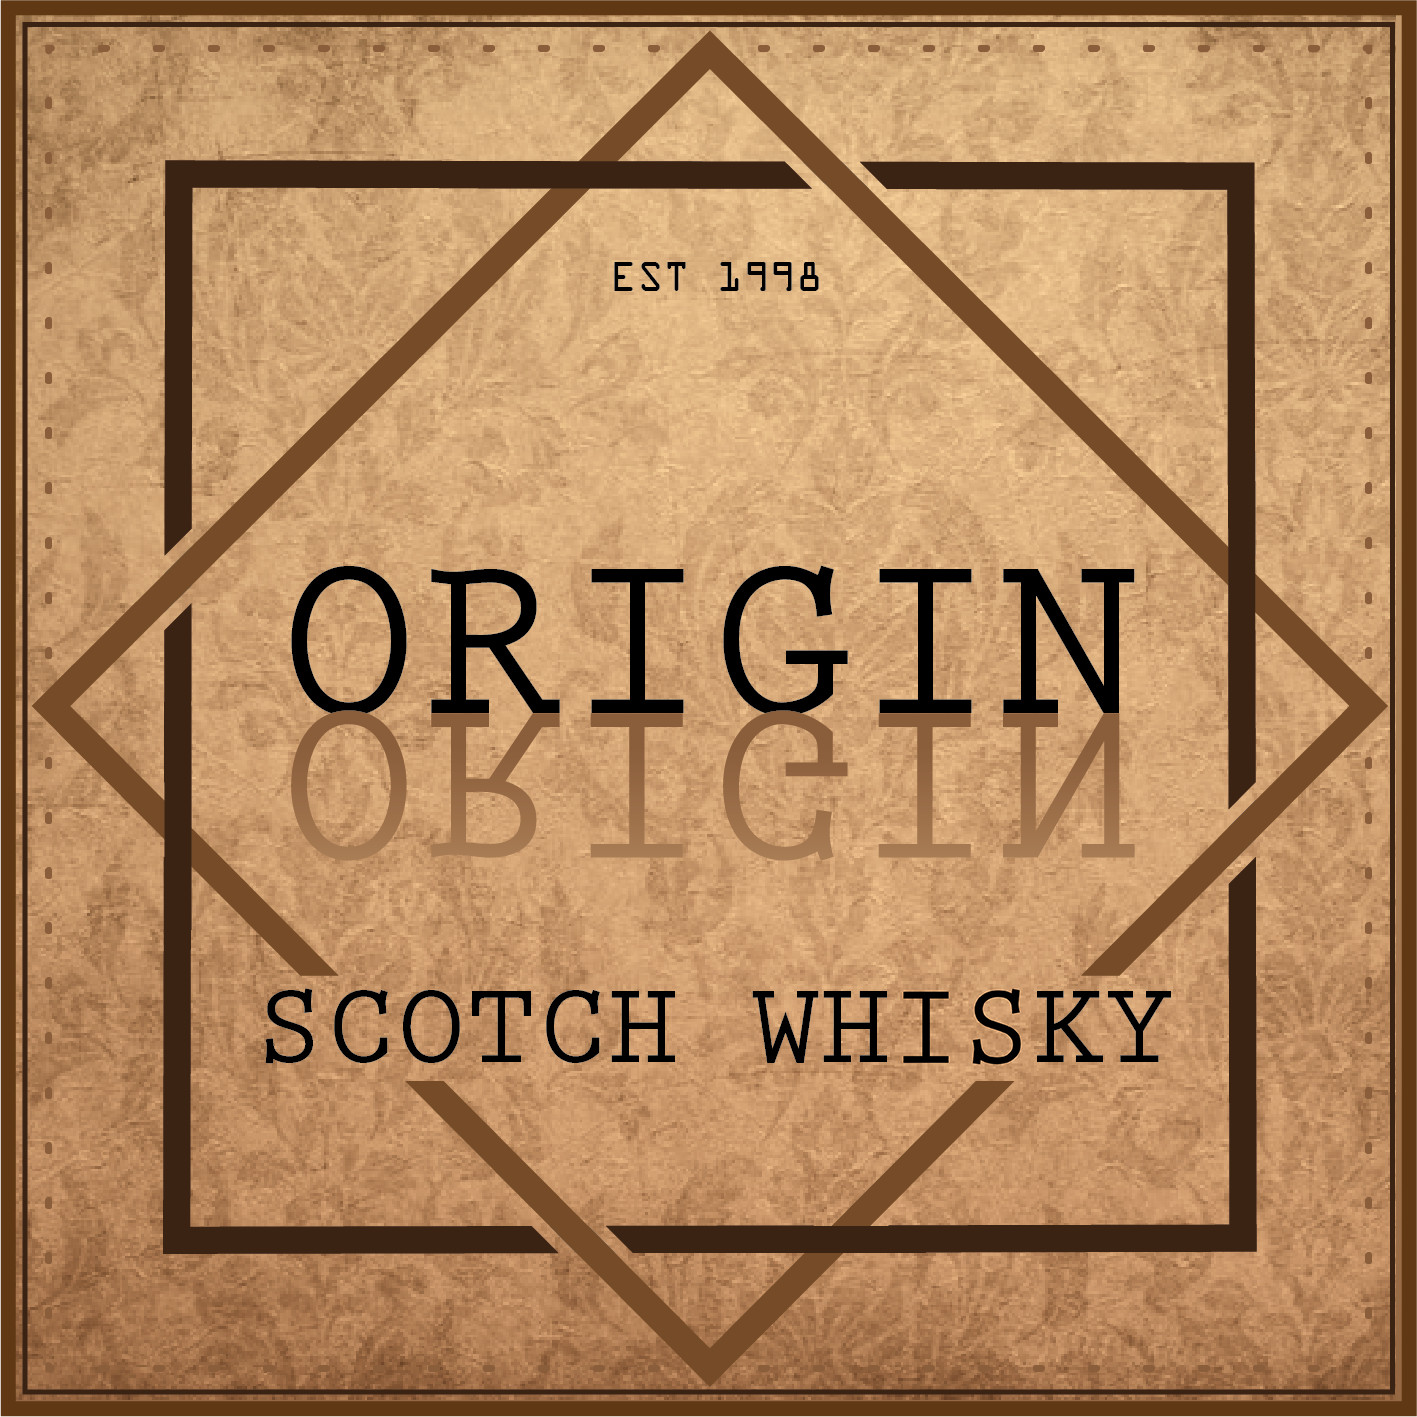 Ravissen carpenen whiskey logo01